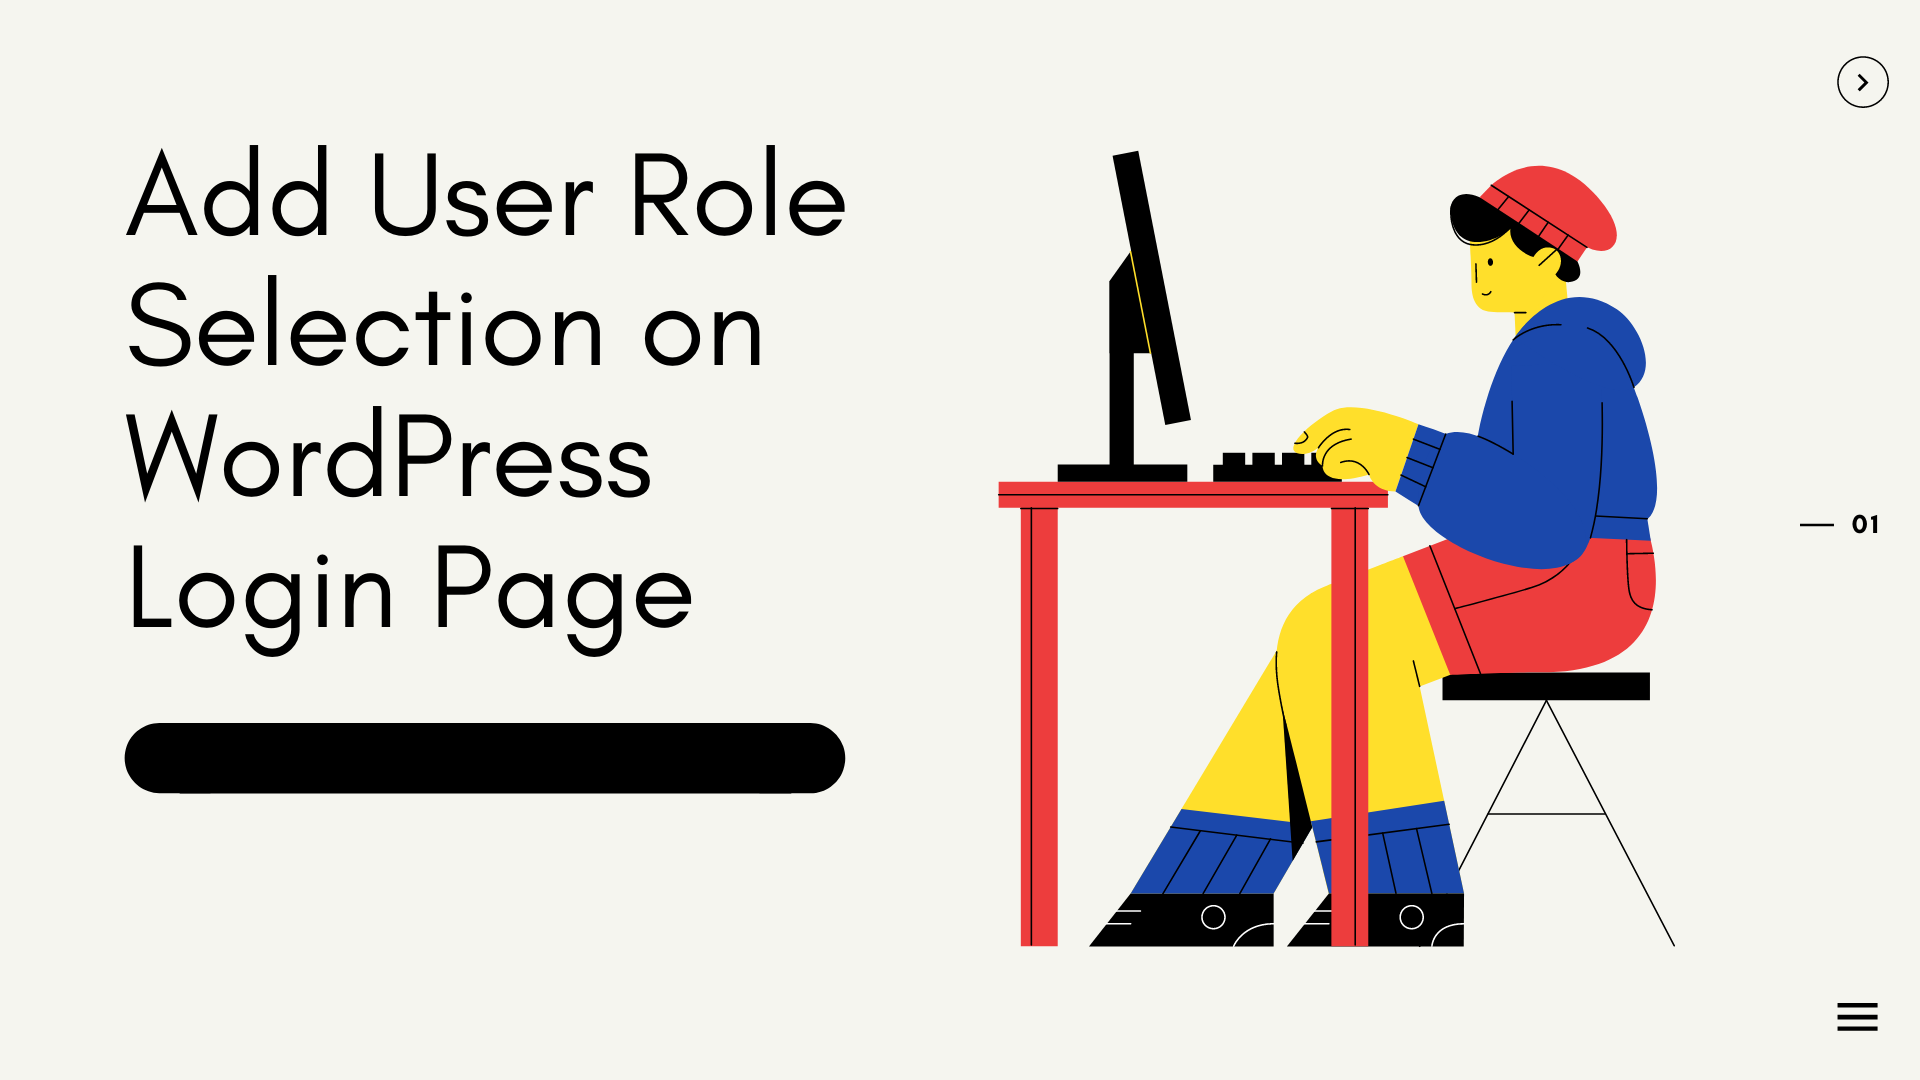 Add User Role Selection on WordPress Login Page